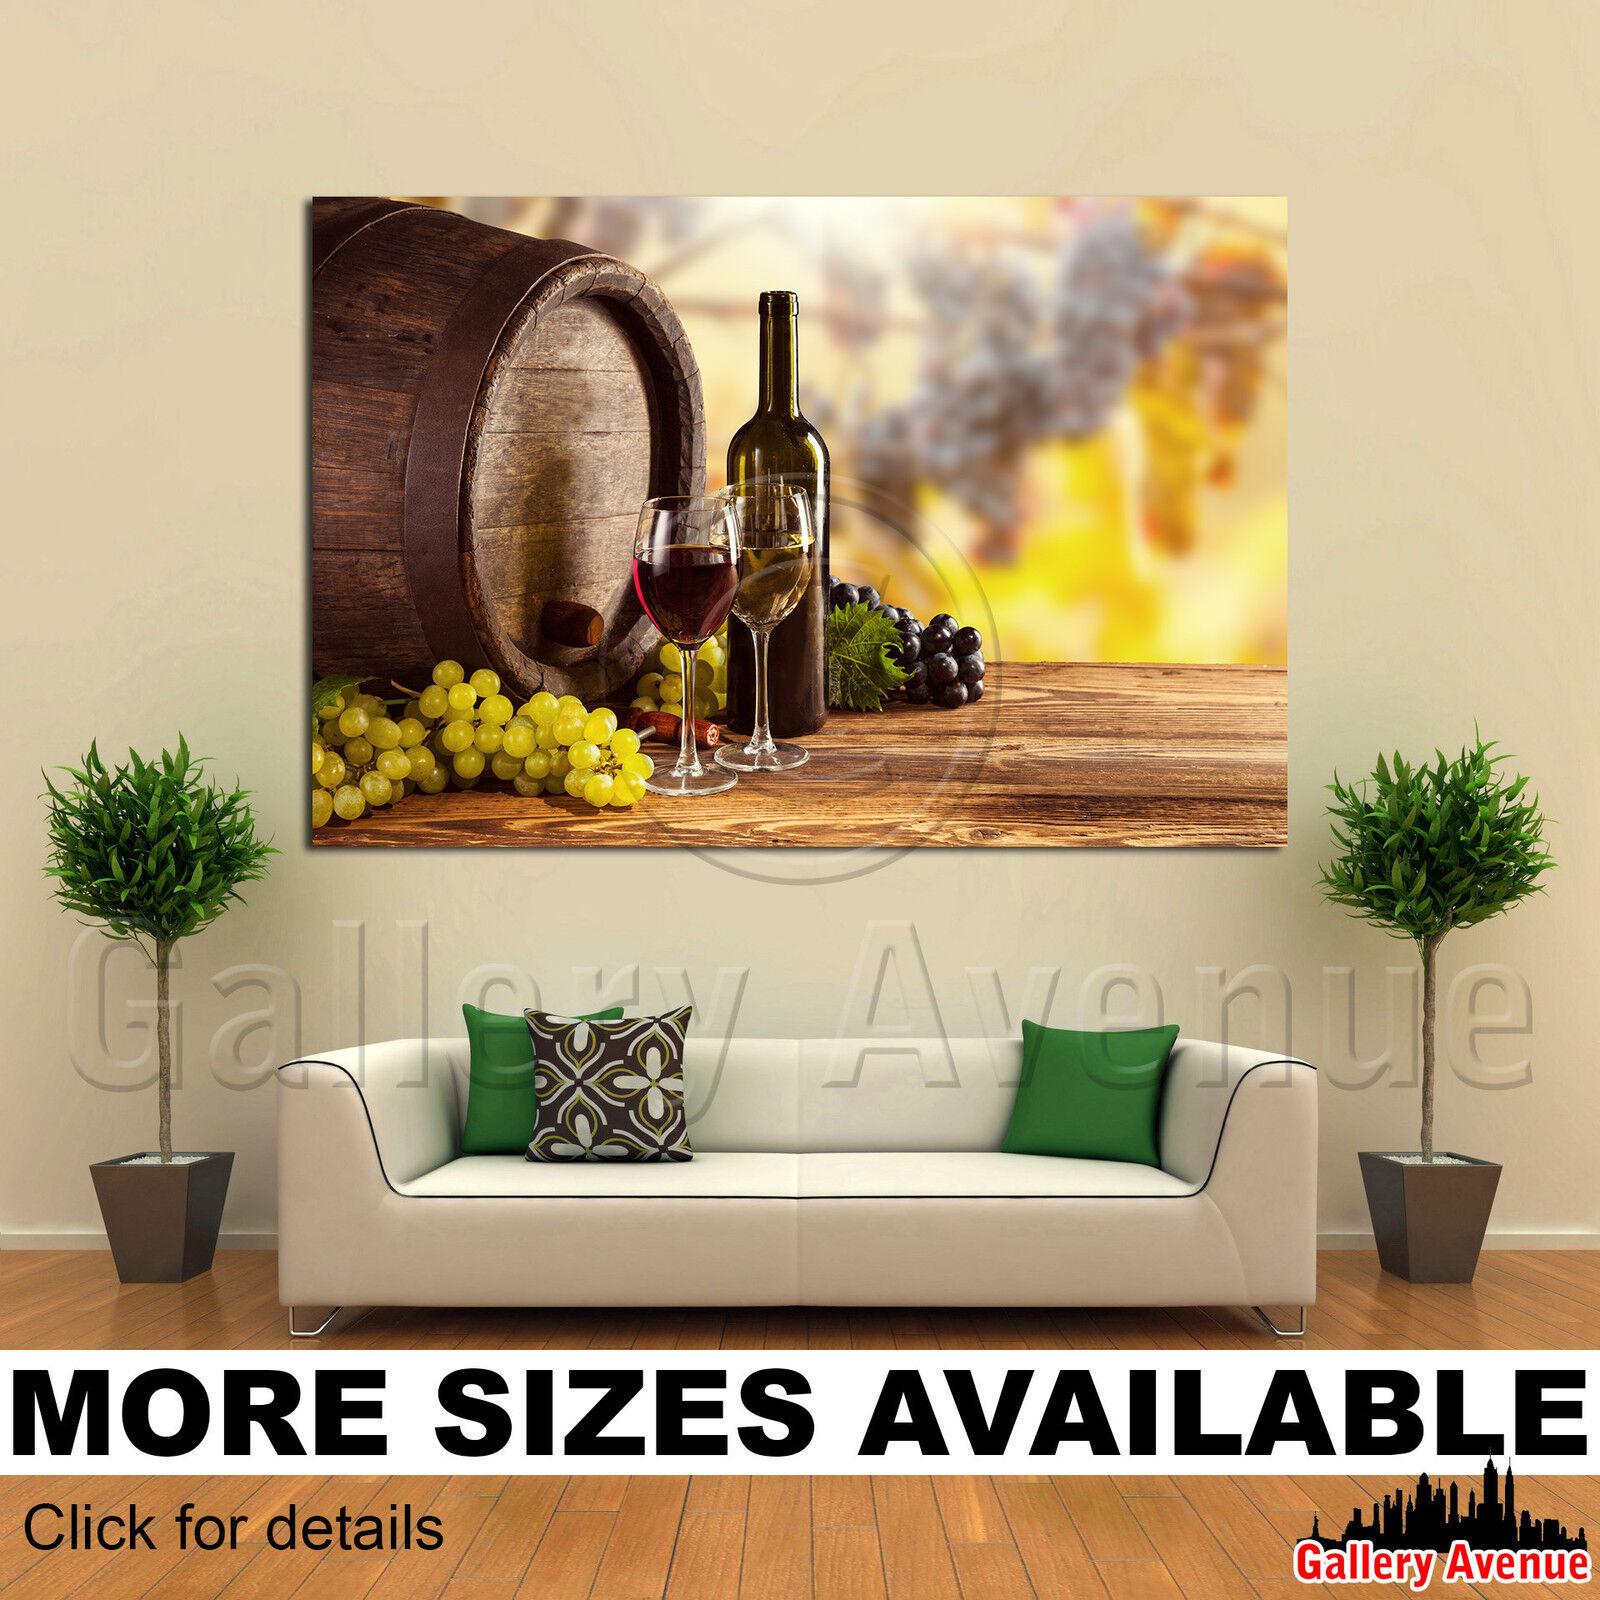 A Wand Kunst Canvas Bild Drucken - Bottle Glas wine wooden barrel grapes 3.2